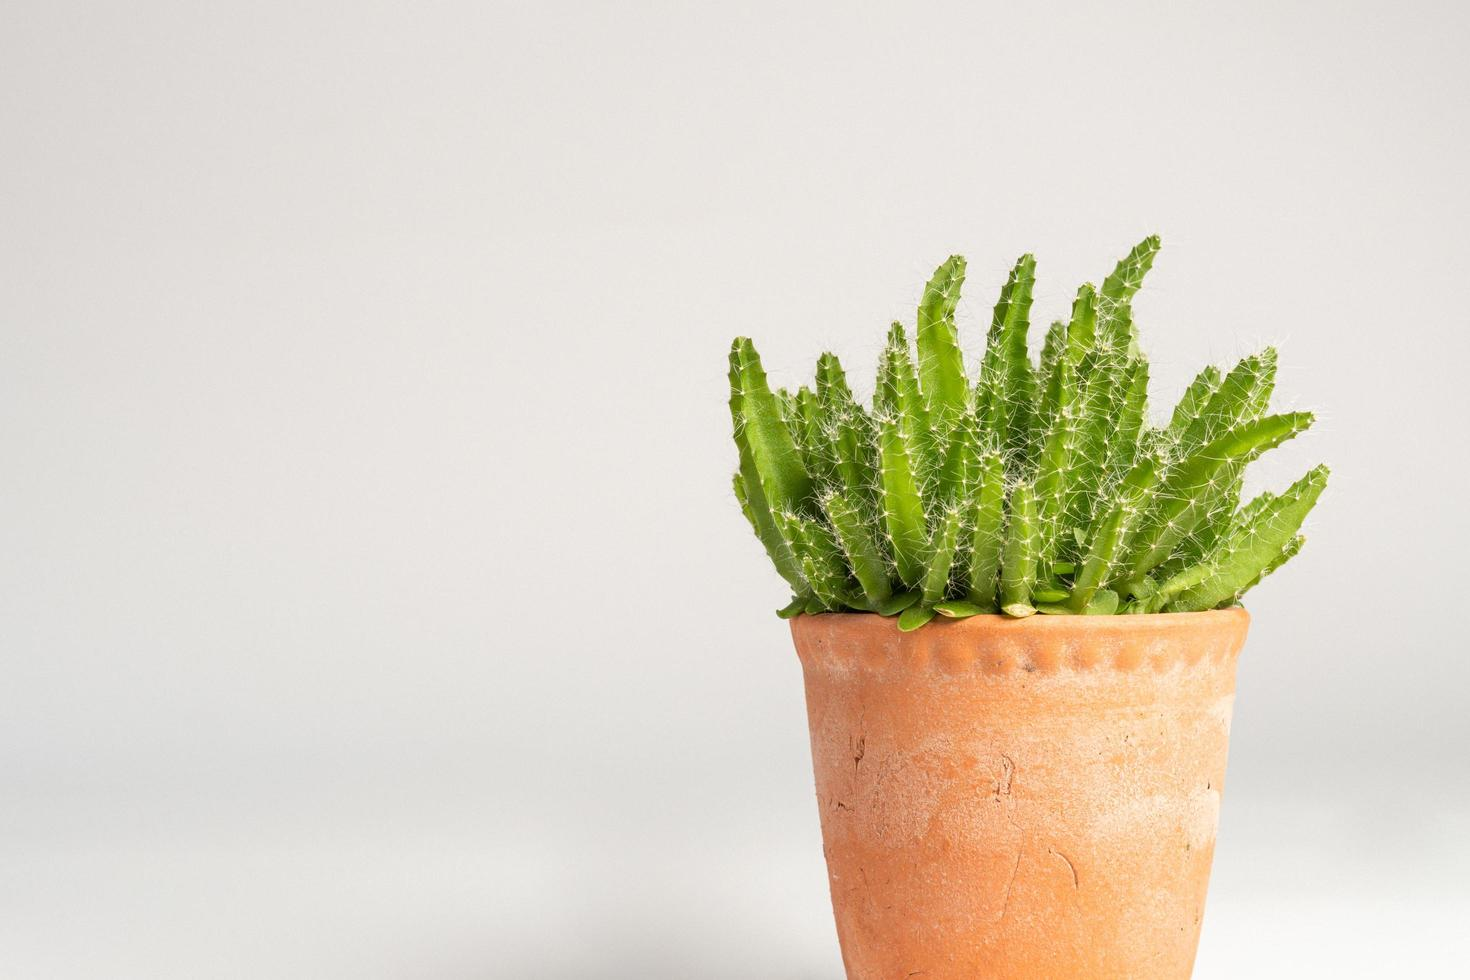 cactus plant op witte achtergrond foto